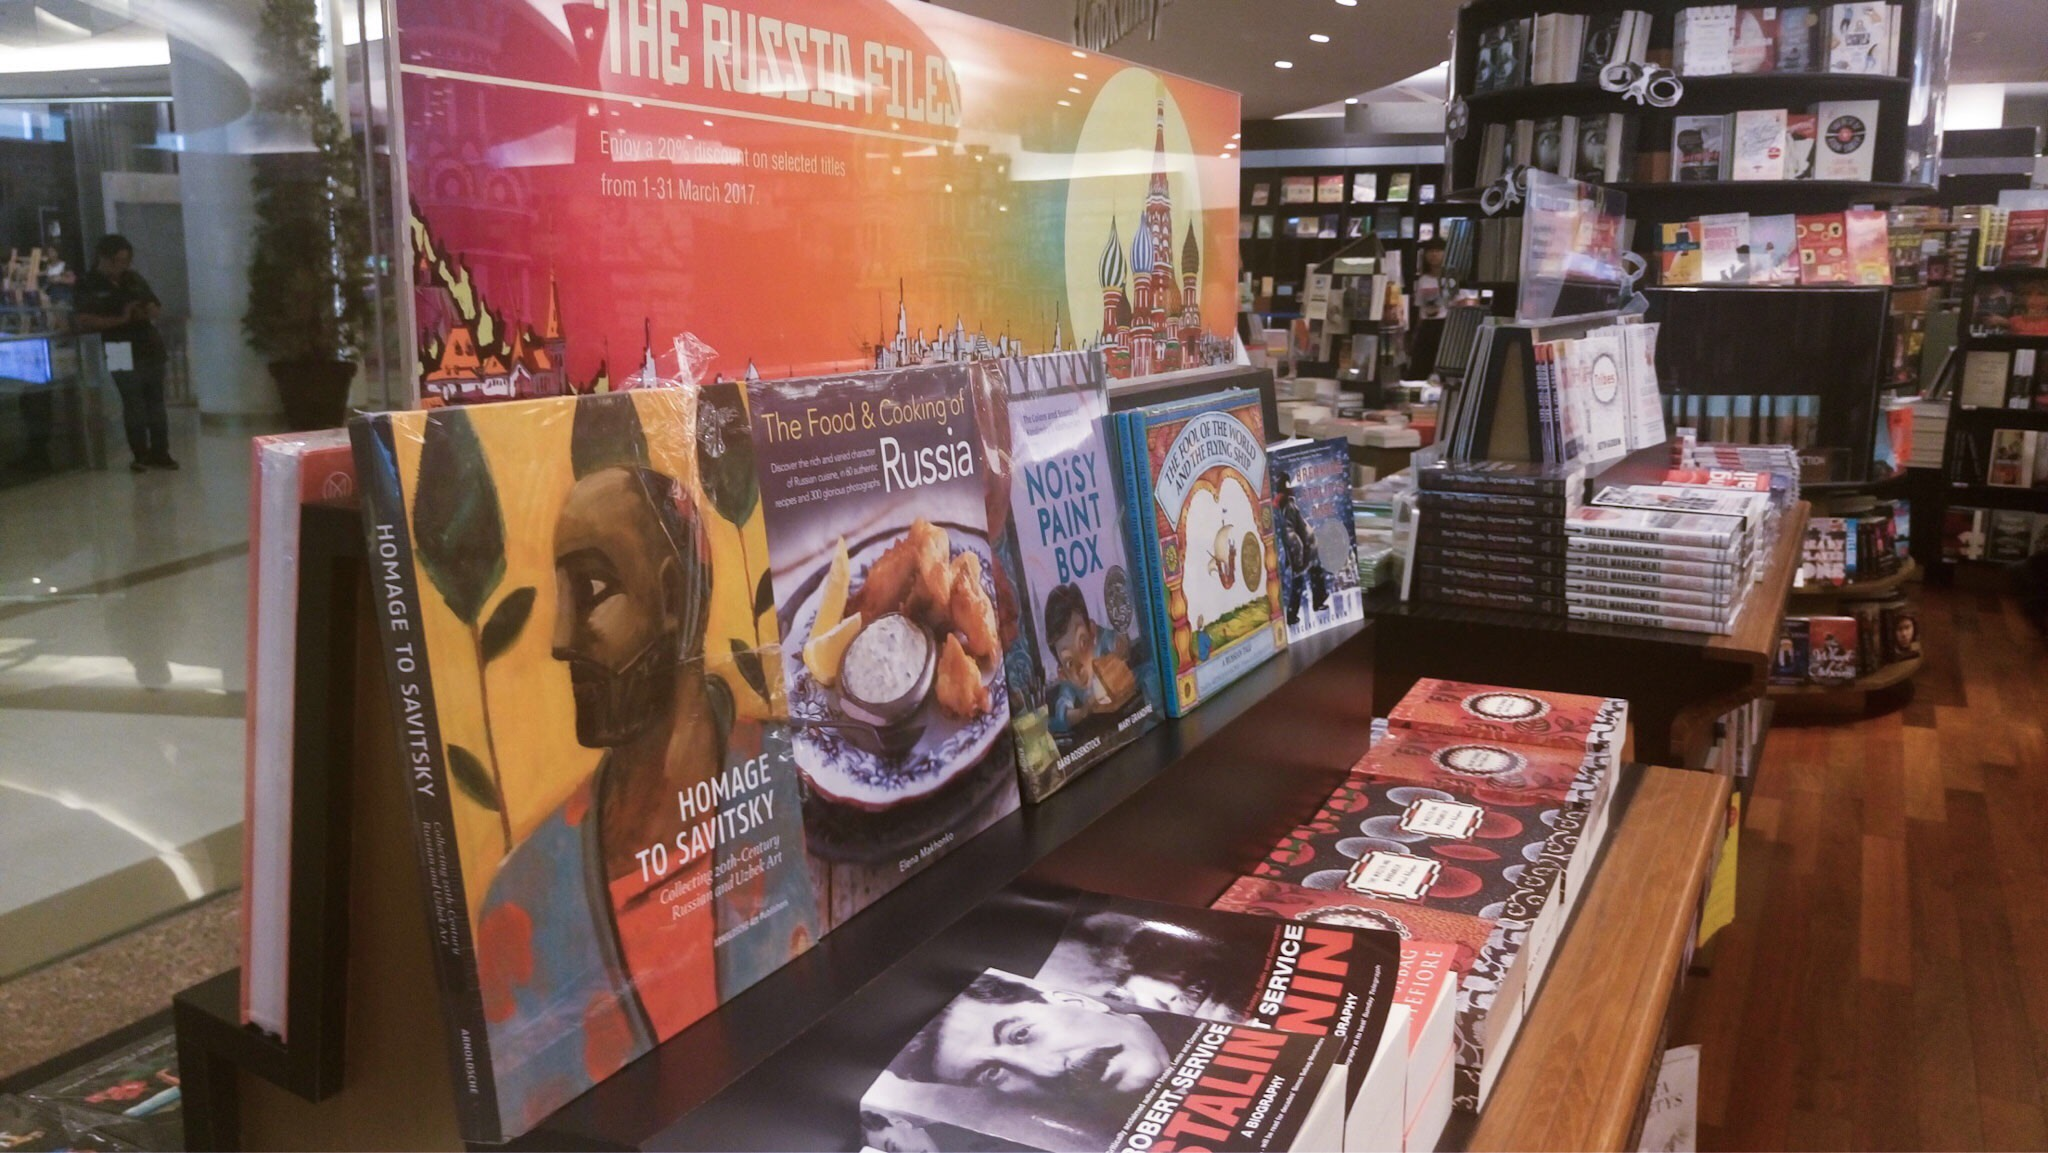 Russia is now a popular theme for book-lovers in Thailand / Irina Vinokurova (Bangkok)